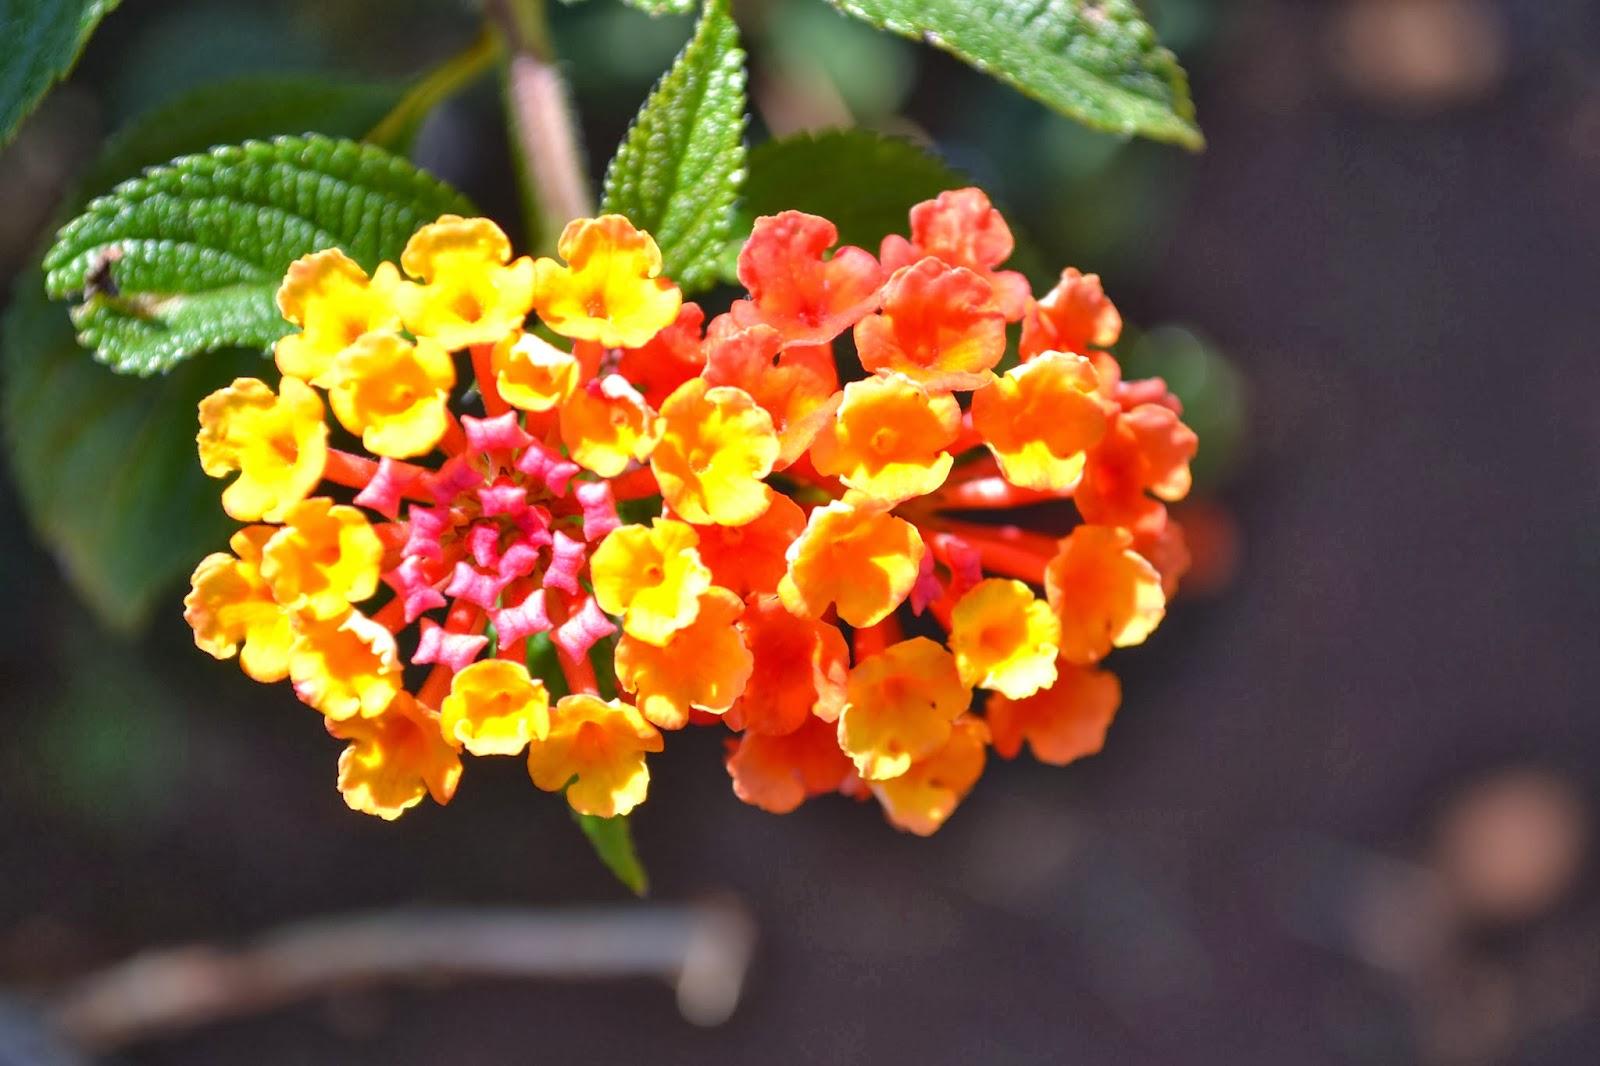 Bright yellow, orange and pink flowers